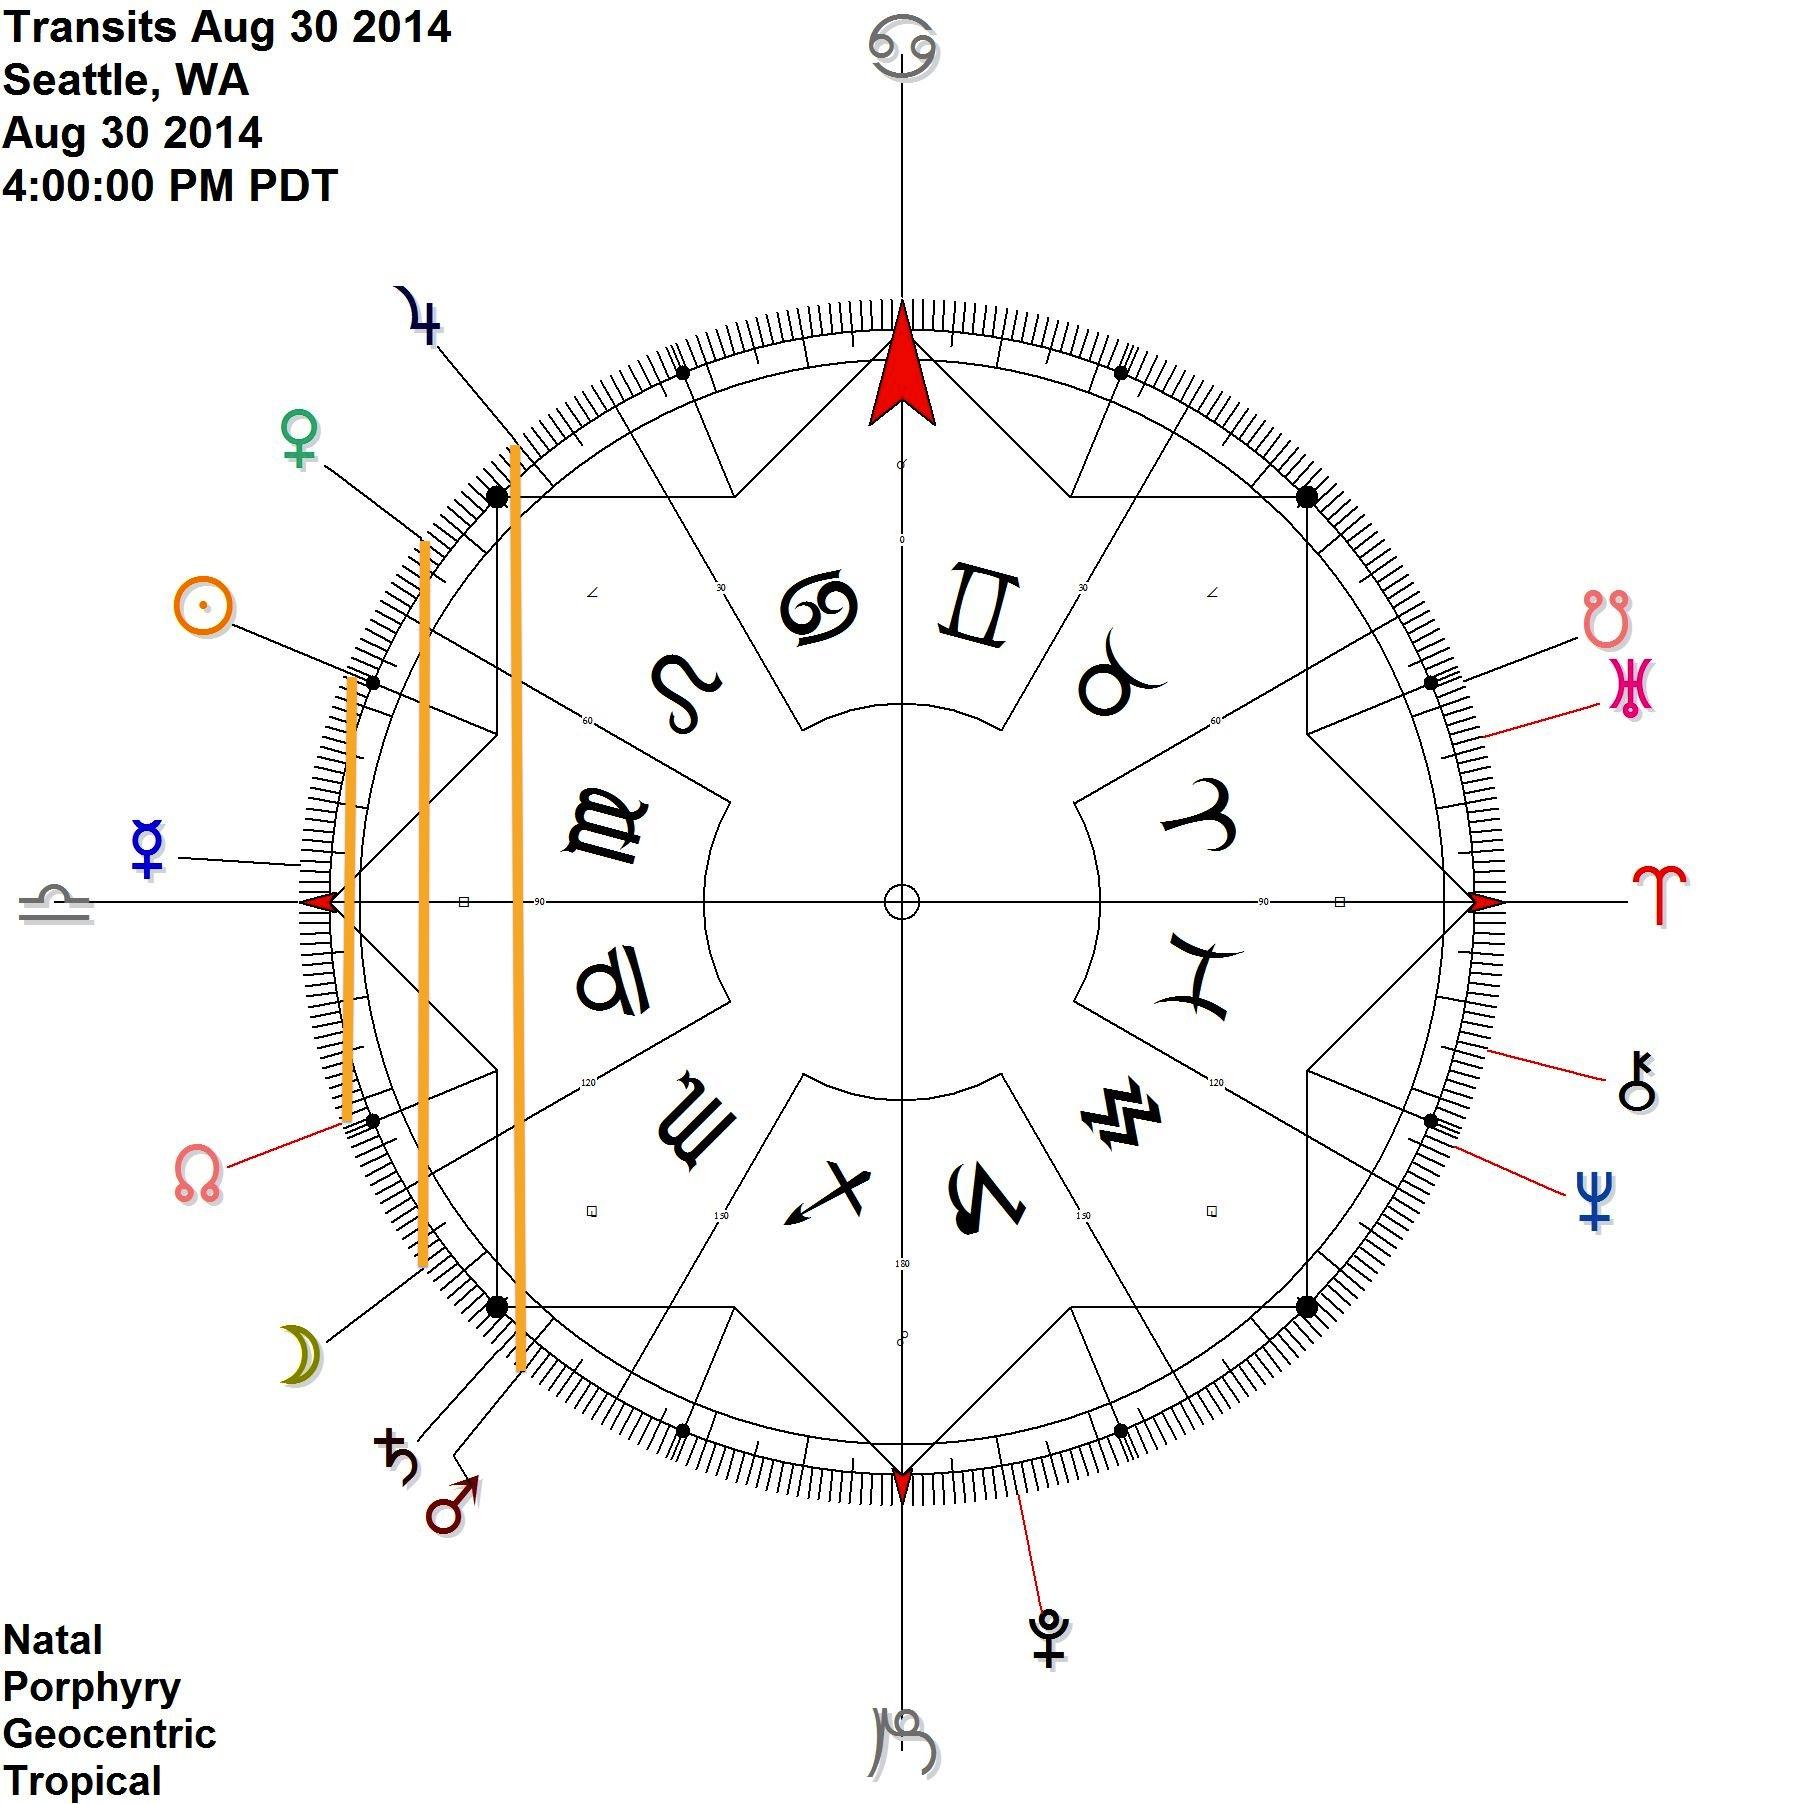 All in contra-antiscia:  Mars Jupiter, Moon Venus, and Sun Node